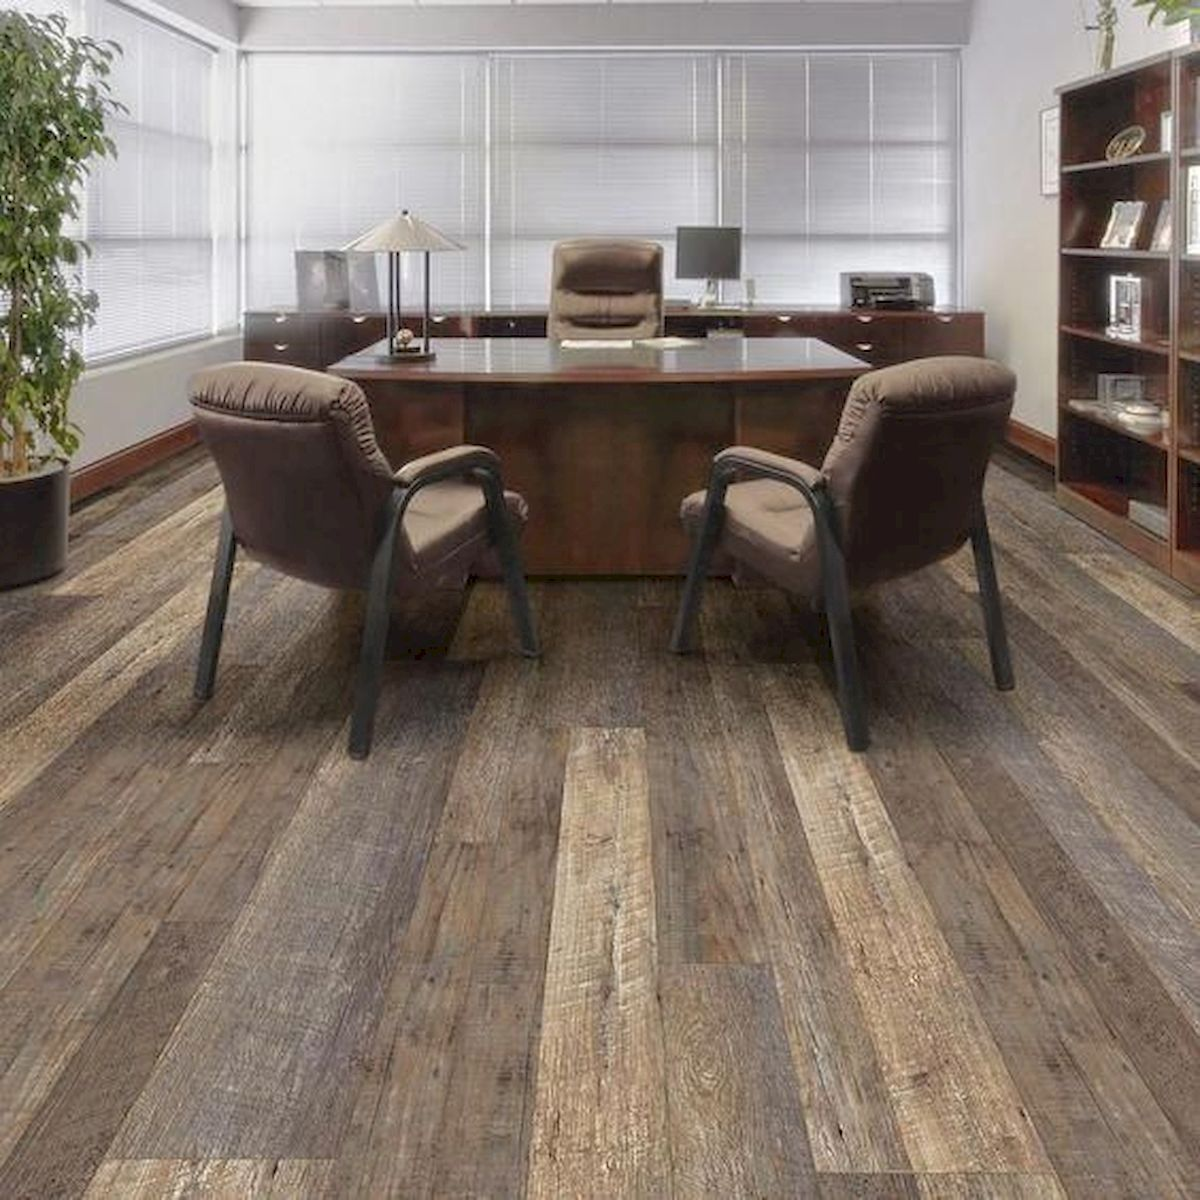 80 Gorgeous Hardwood Floor Ideas for Interior Home (28)